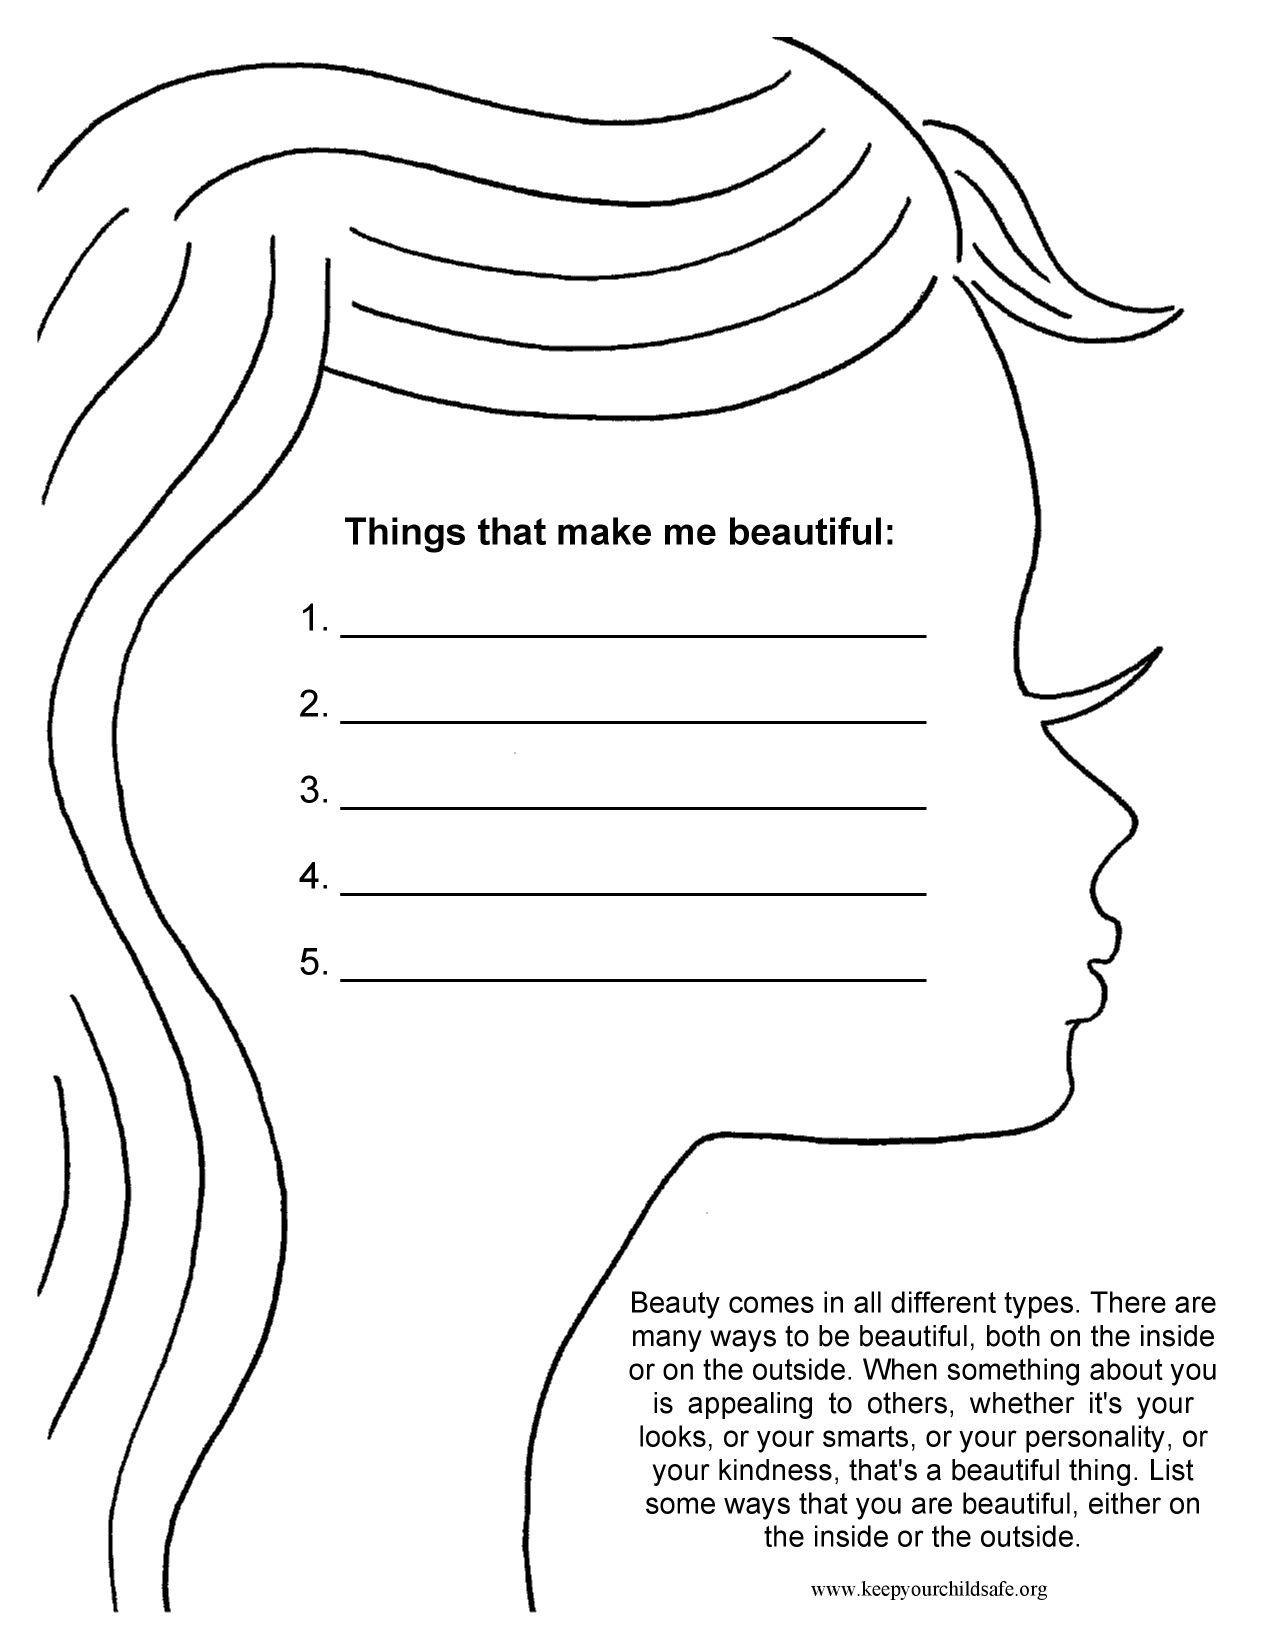 Self Esteem Worksheet for Adults Things that Make Me Beautiful